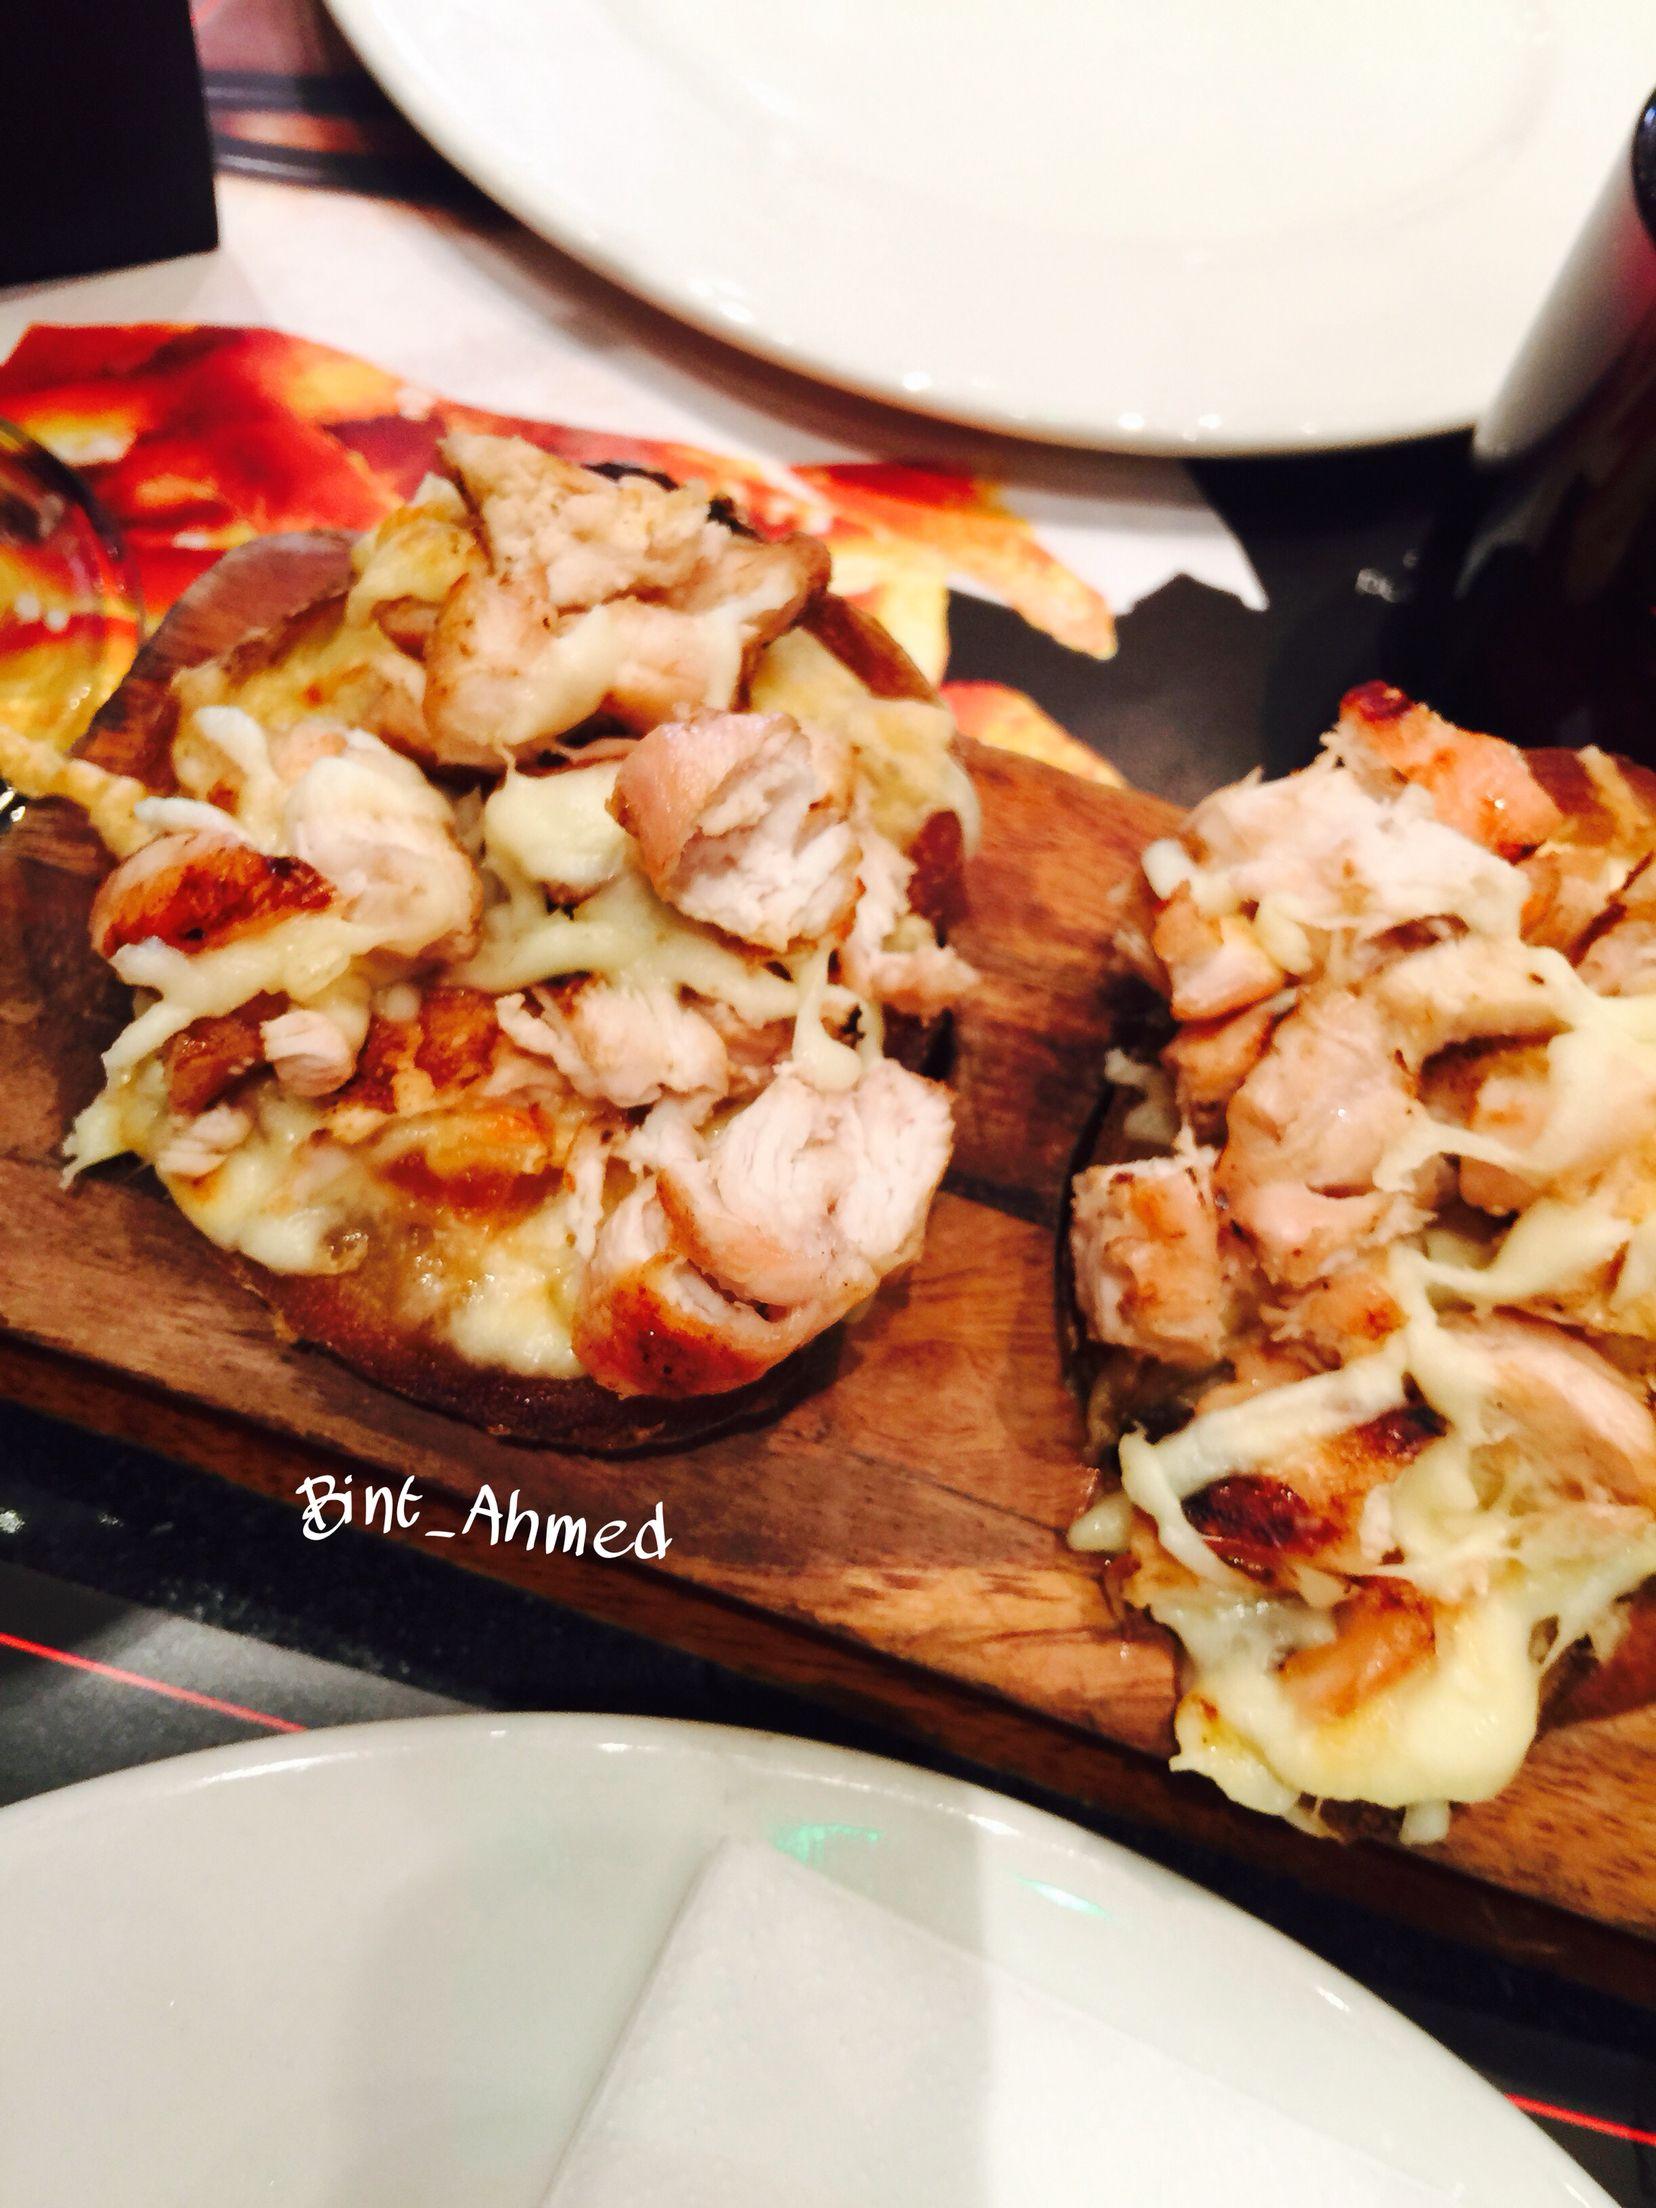 Restaurant Italian Chicken Cheese Food Delicious Oxford Street London Bread Food Yummy Food Delicious